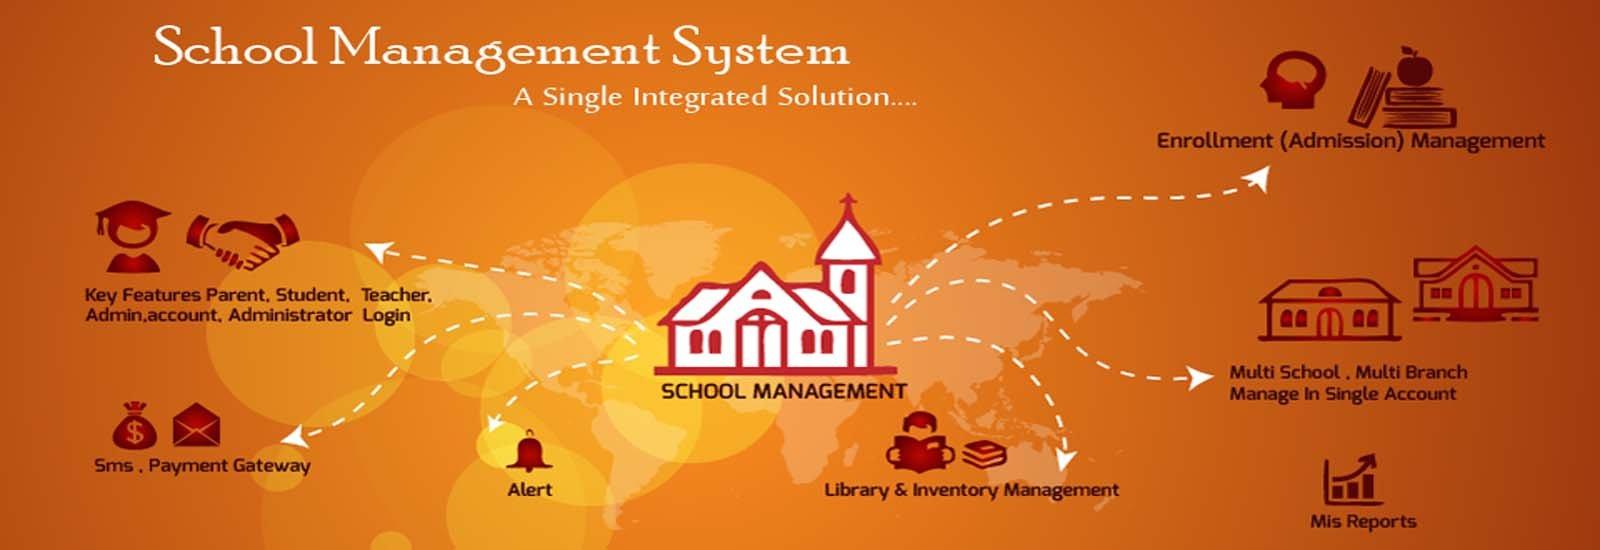 School Management Software Development in Bhubaneswar